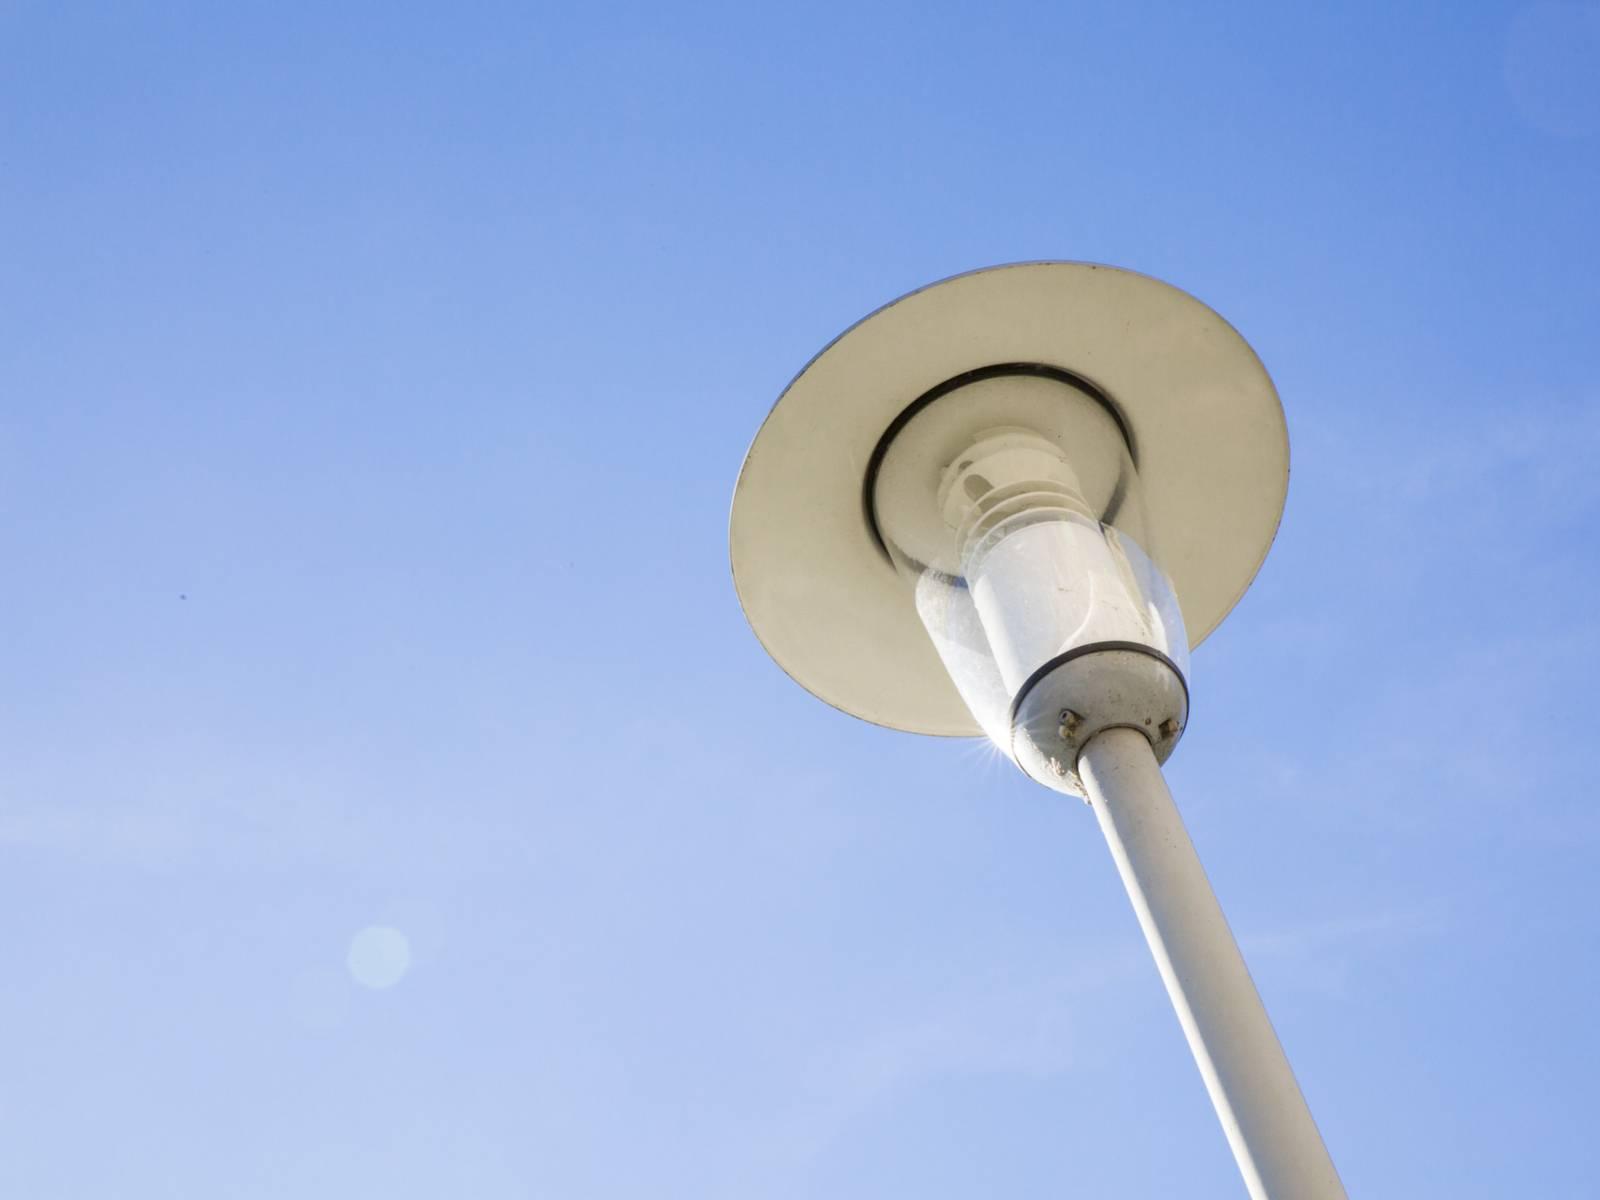 Beleuchtungsmasten